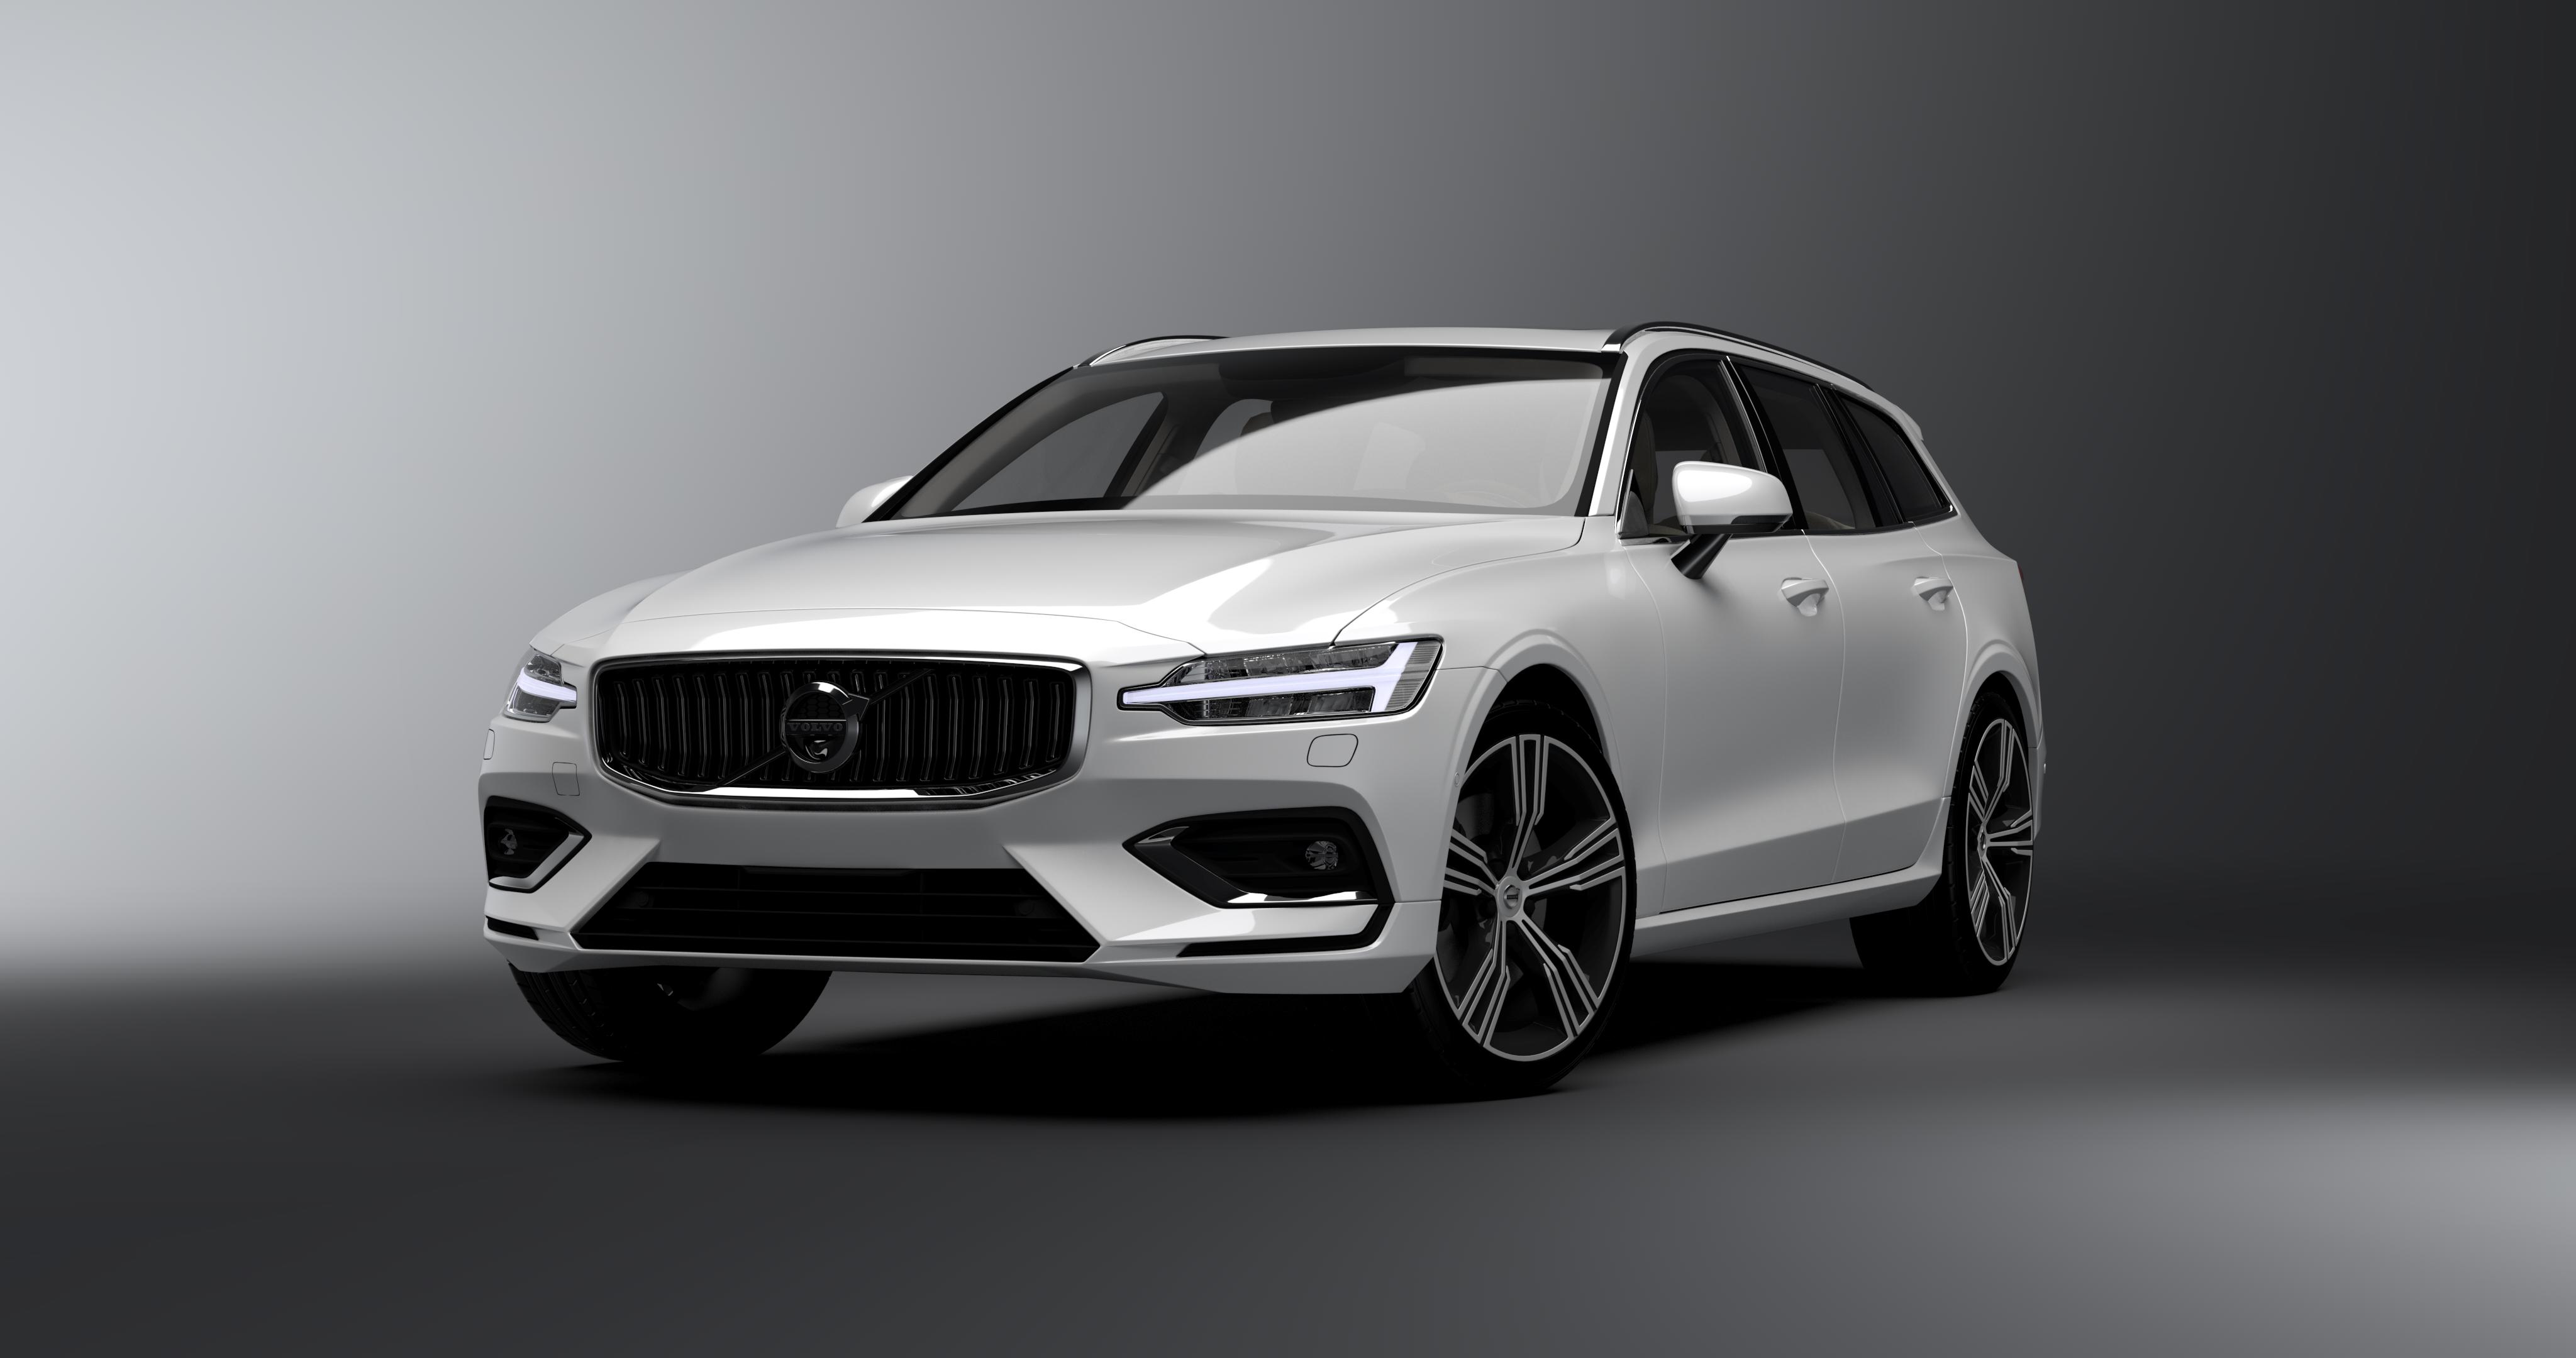 General 4096x2160 Volvo V60 car Volvo V60 vehicle automotive 3D visualization Swedish cars